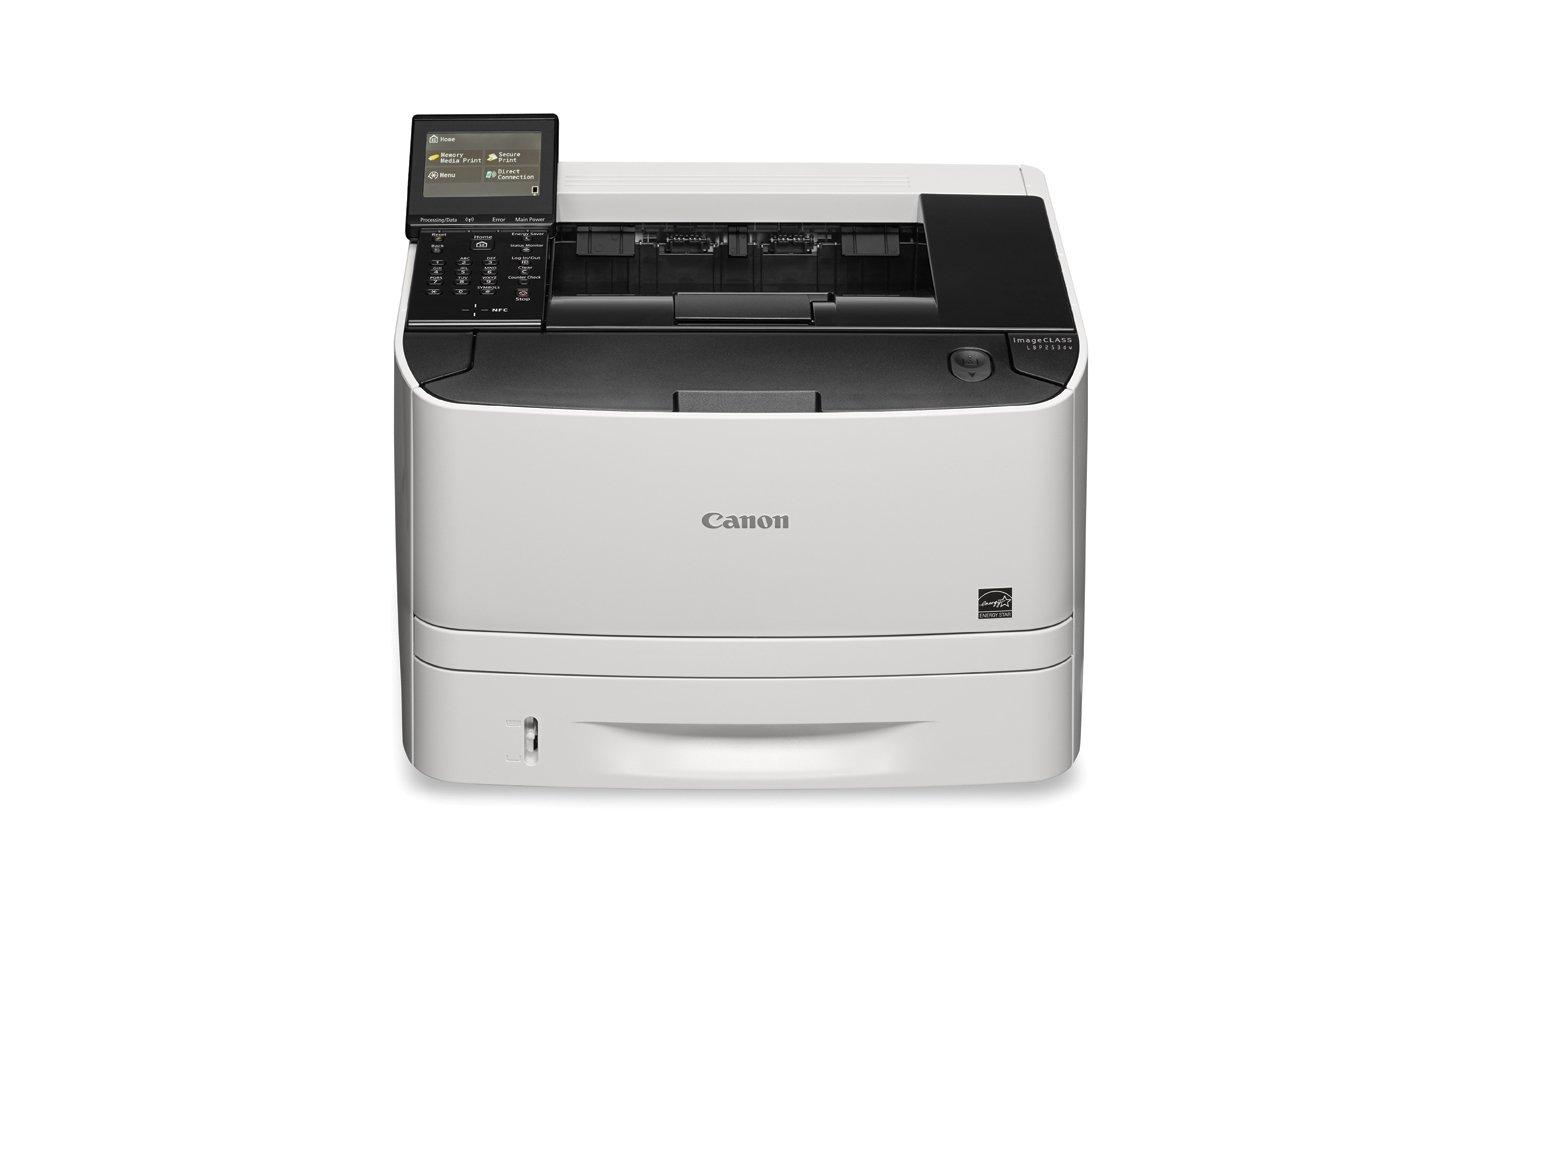 Canon Lasers imageCLASS LBP253dw Wireless Monochrome Printer